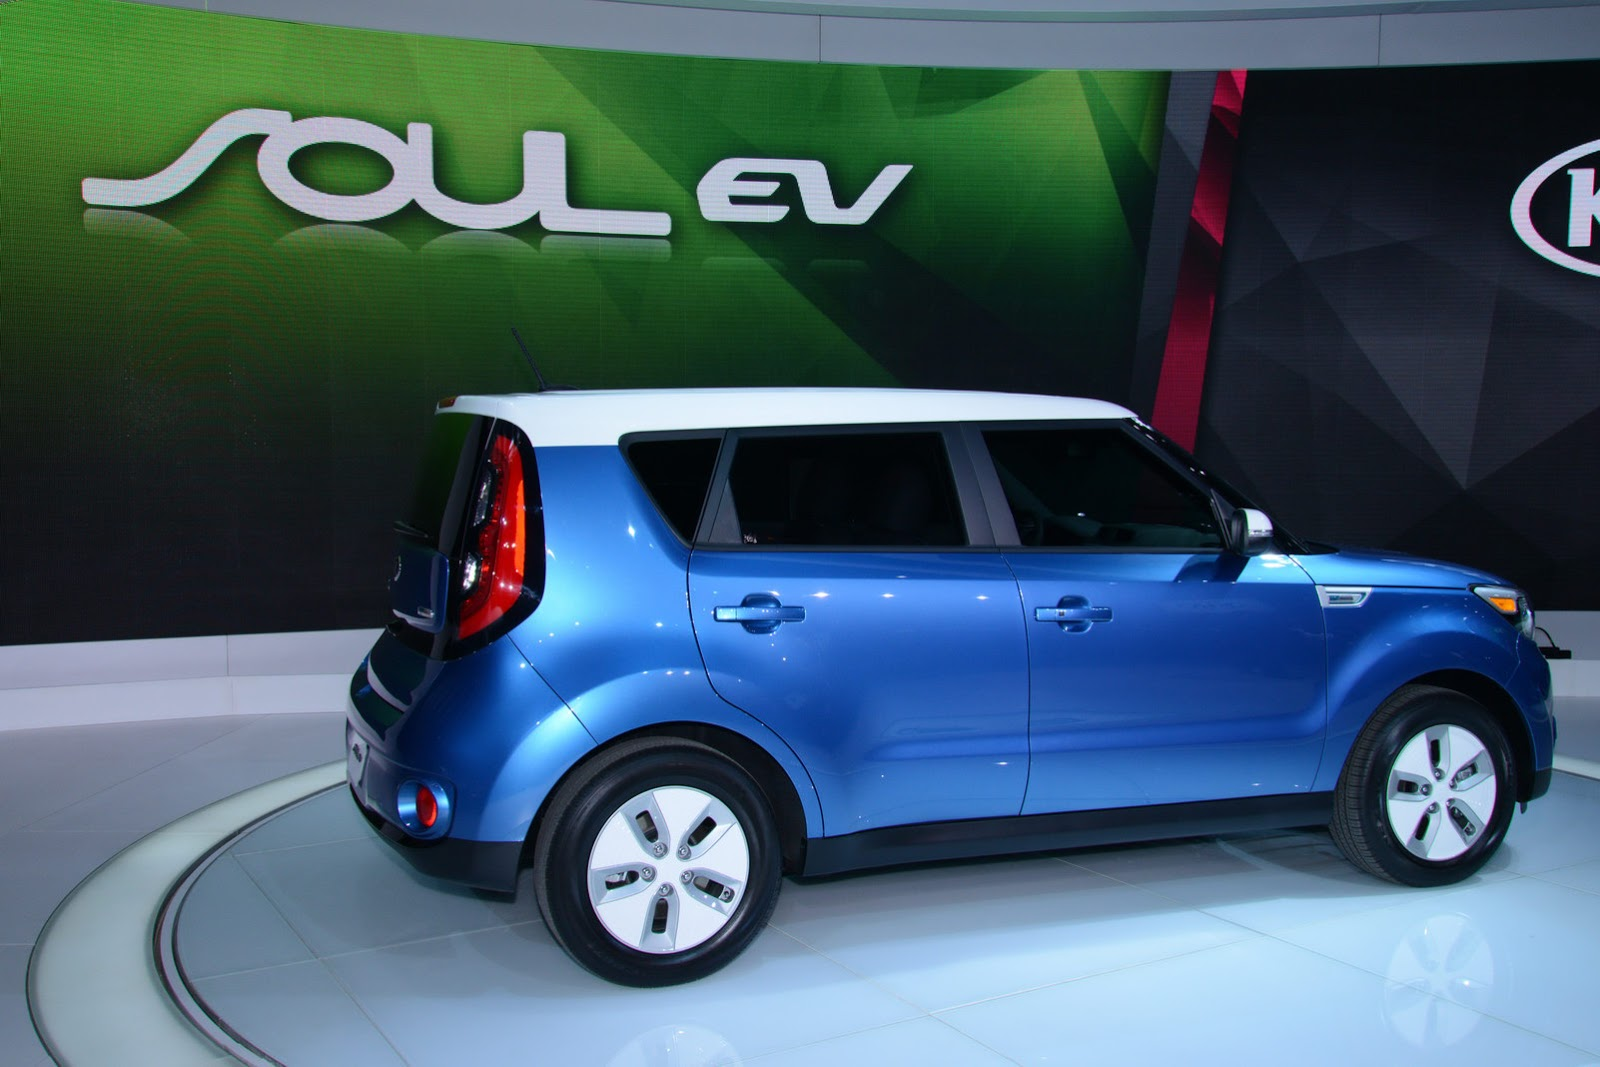 New Electric 2015 Kia Soul From 33 700 Sans 7 500 Tax